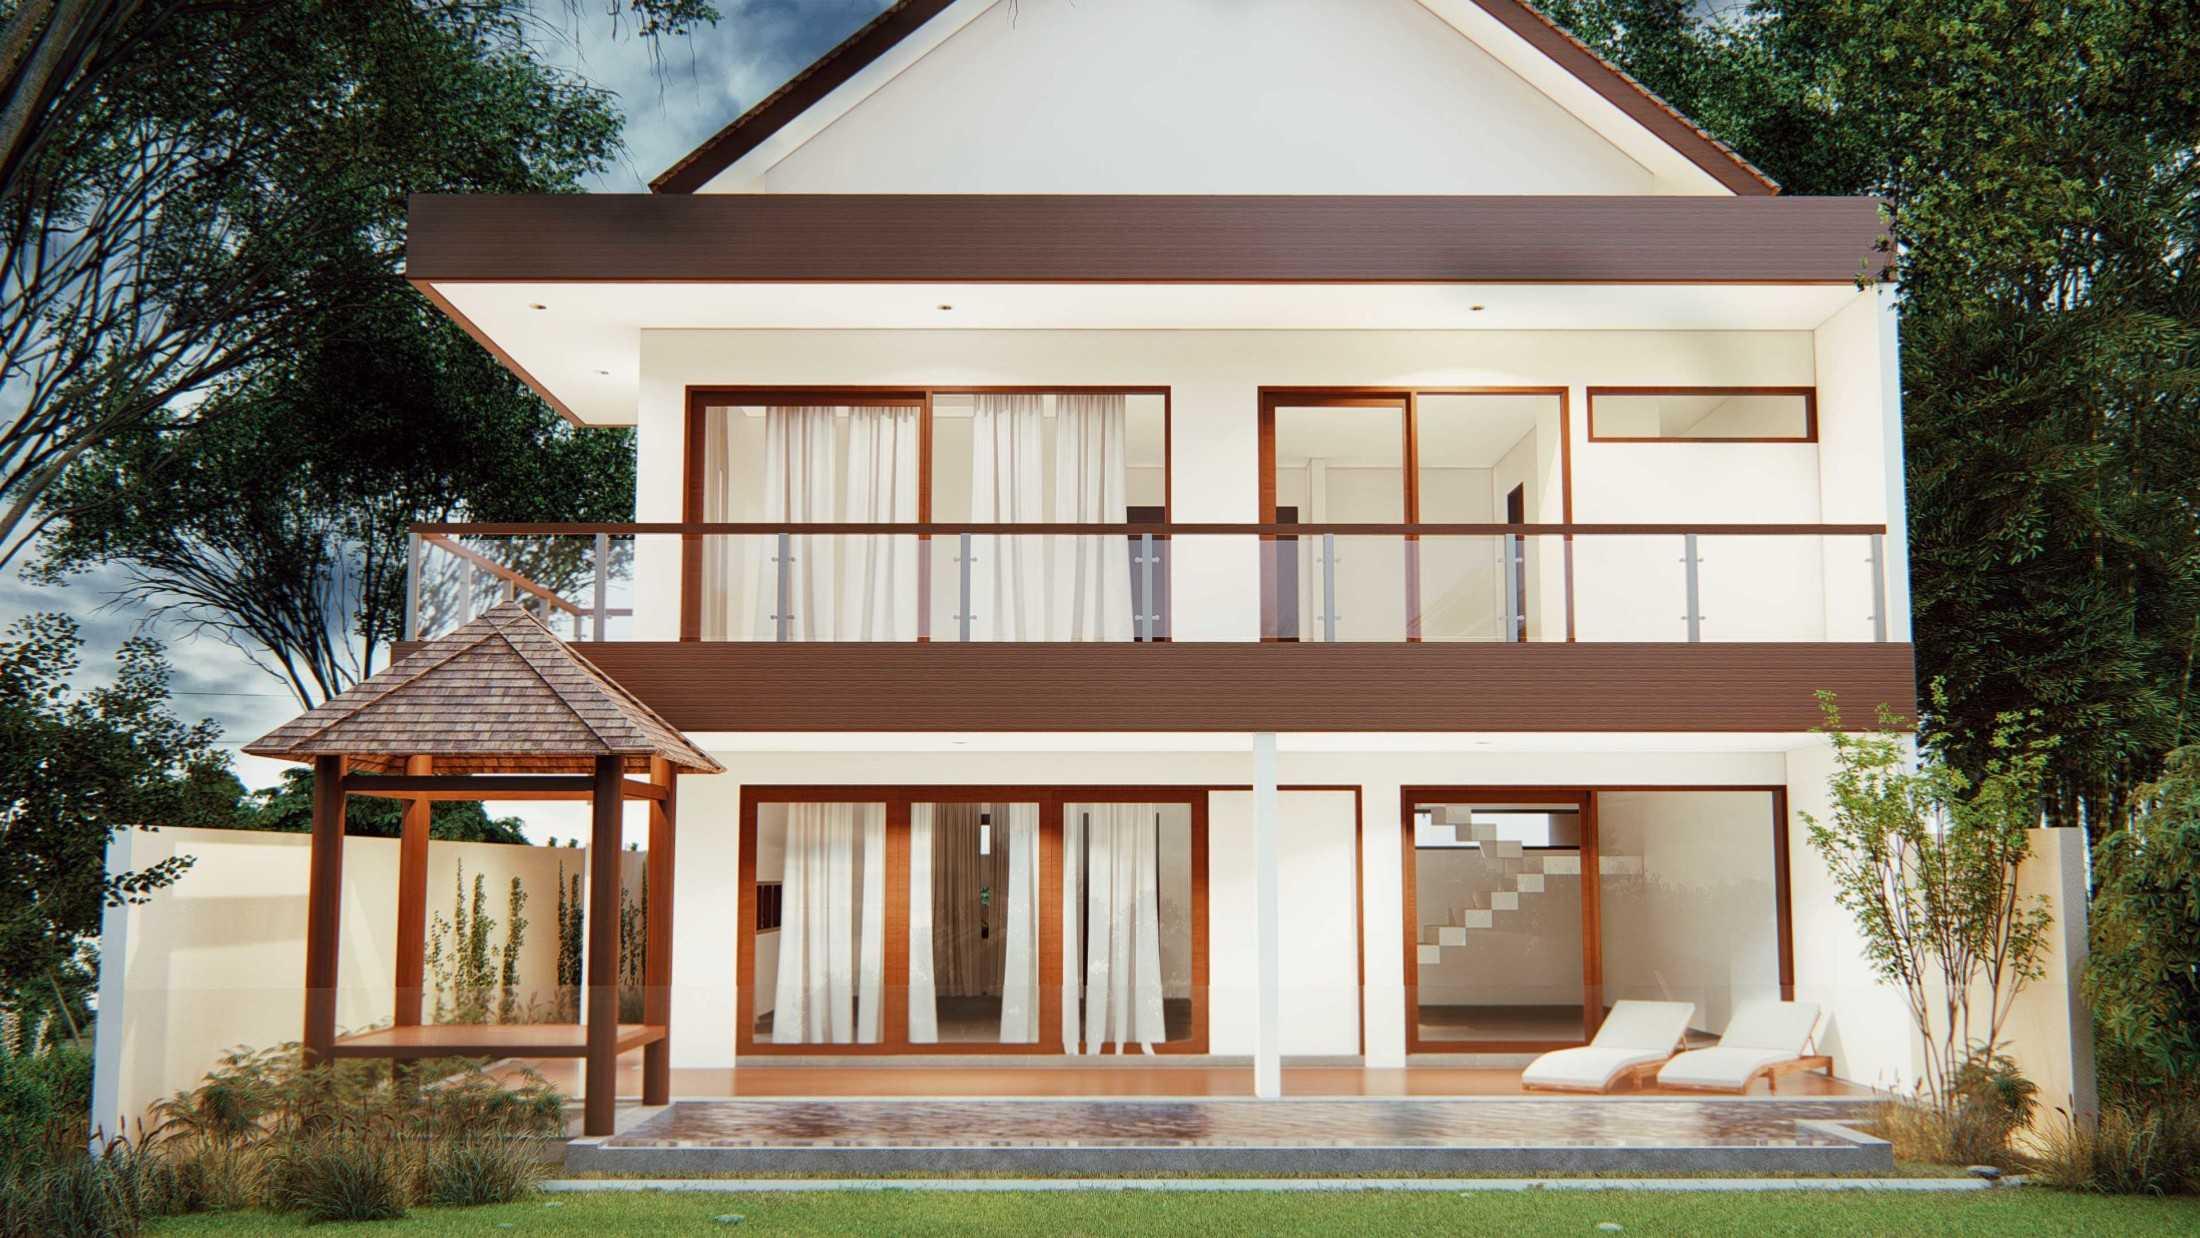 Sequal Design & Construction C Villa Design Canggu, Kec. Kuta Utara, Kabupaten Badung, Bali, Indonesia Canggu, Kec. Kuta Utara, Kabupaten Badung, Bali, Indonesia Sequal-Design-C-Villa-Design  112275